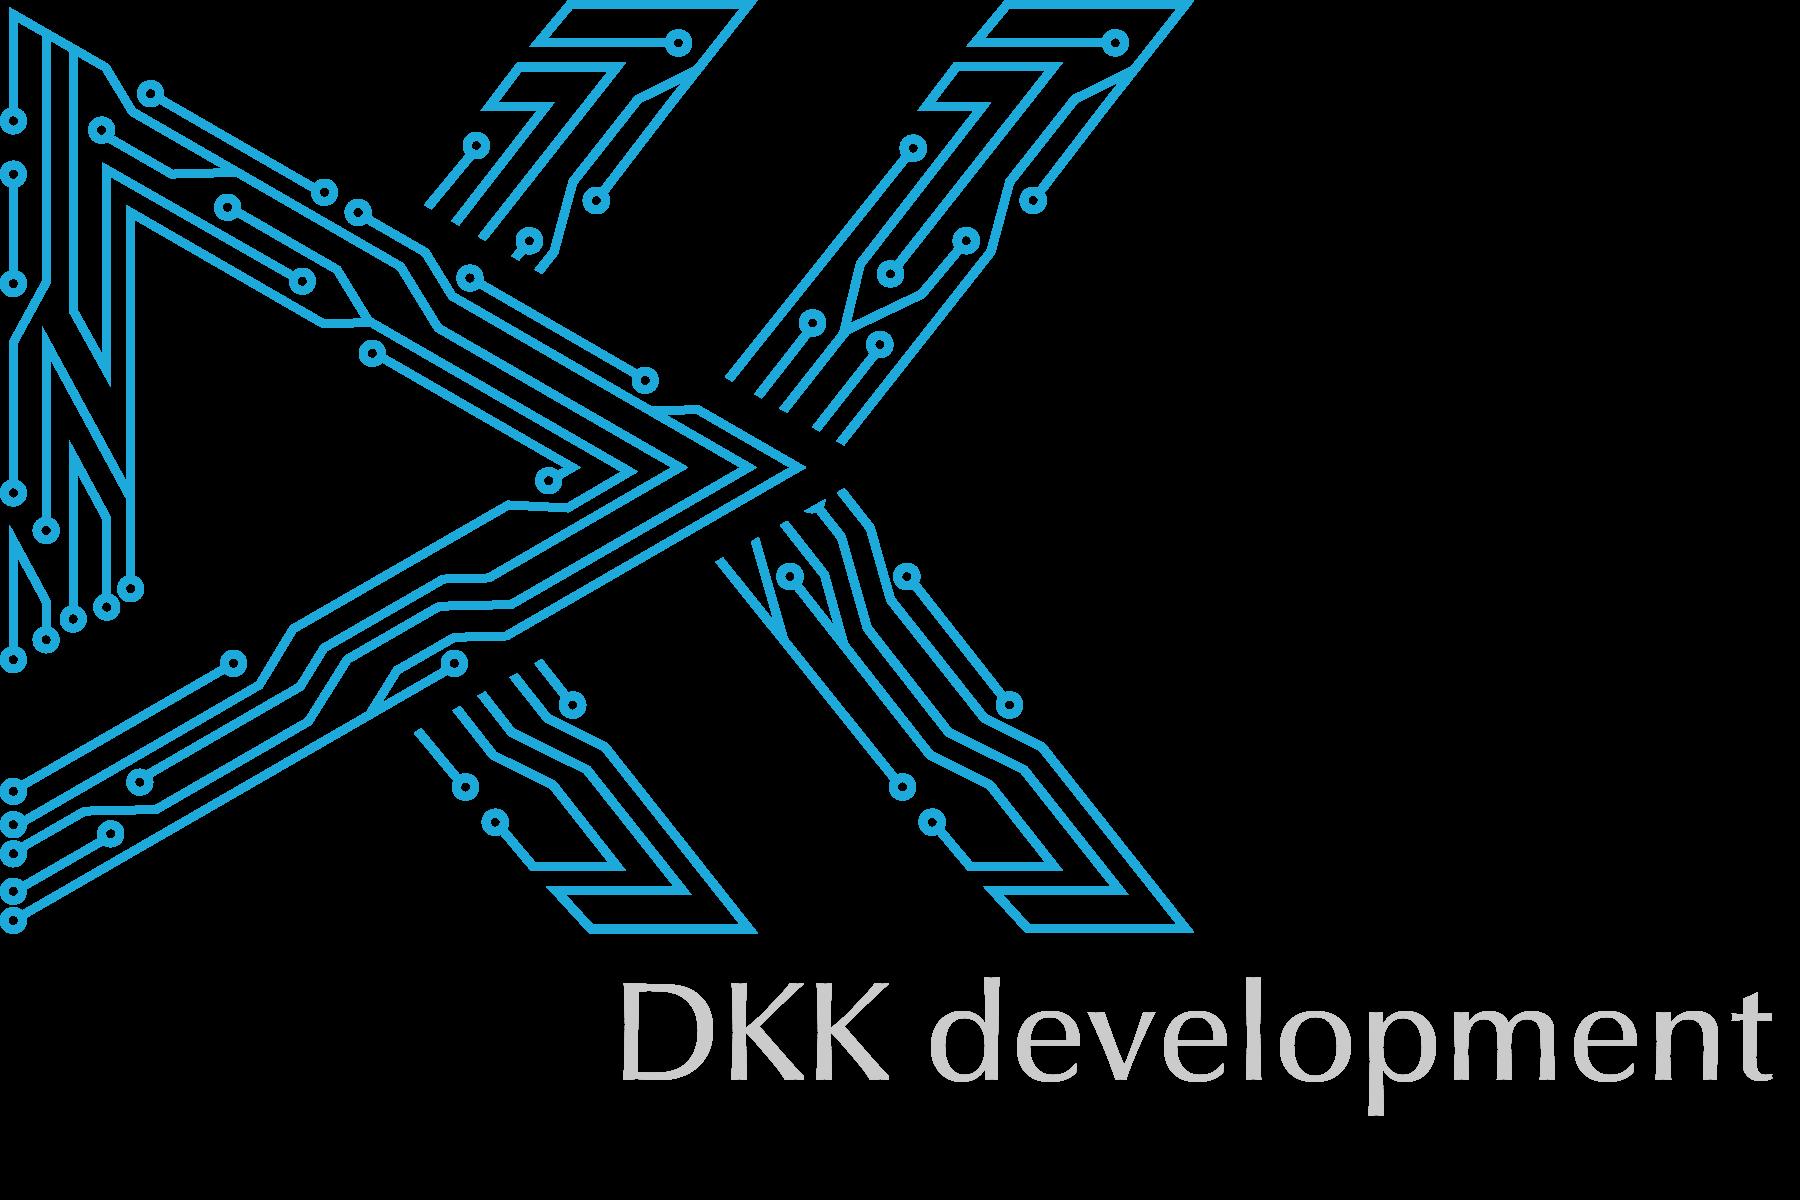 DKK Development